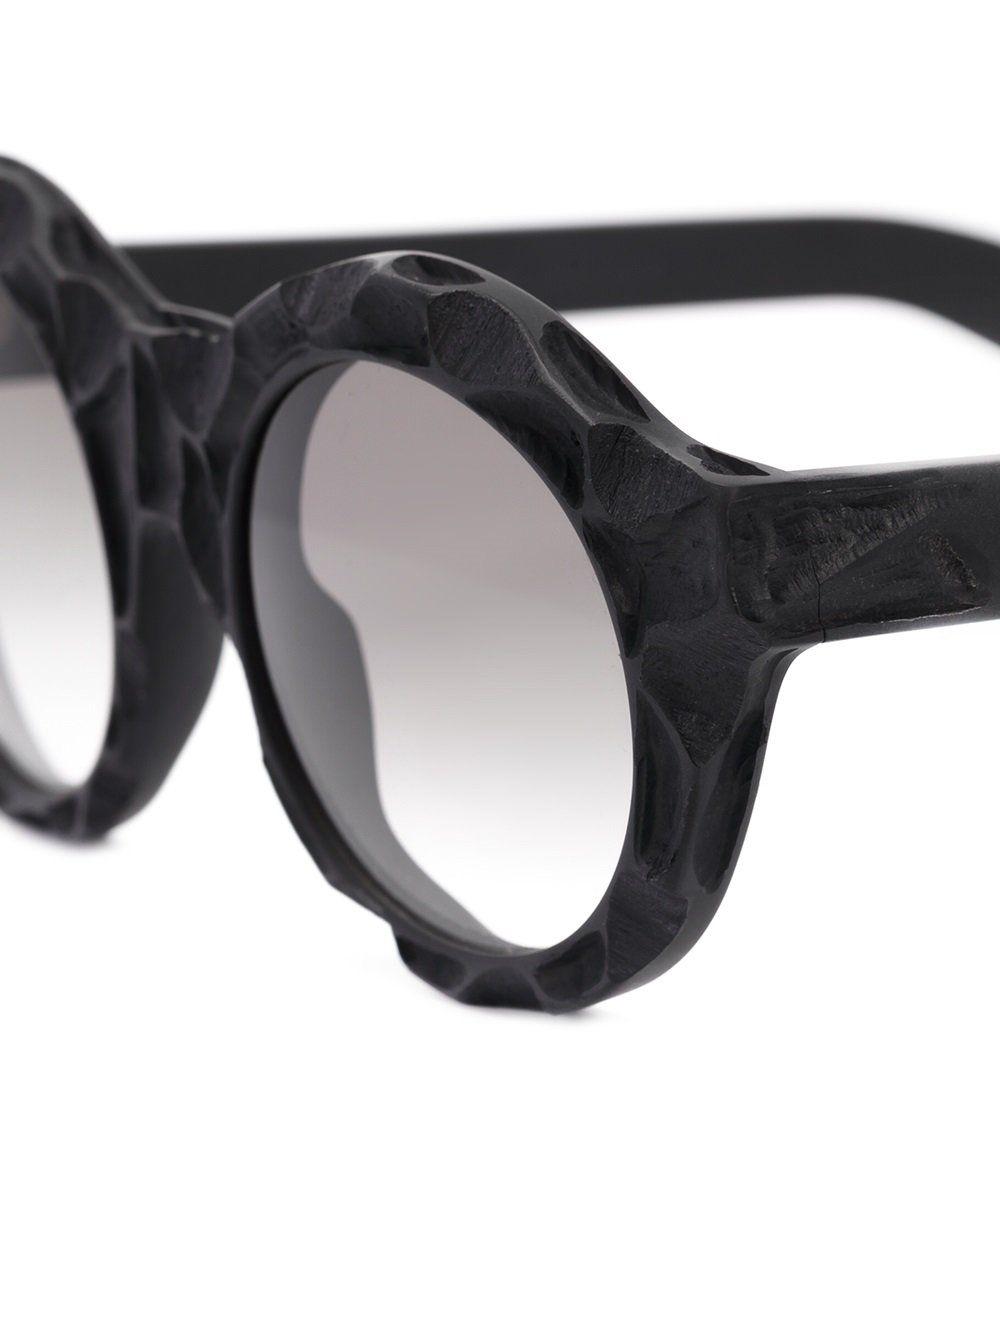 be8c911a685a Kuboraum  Mask K10  Brille - Farfetch